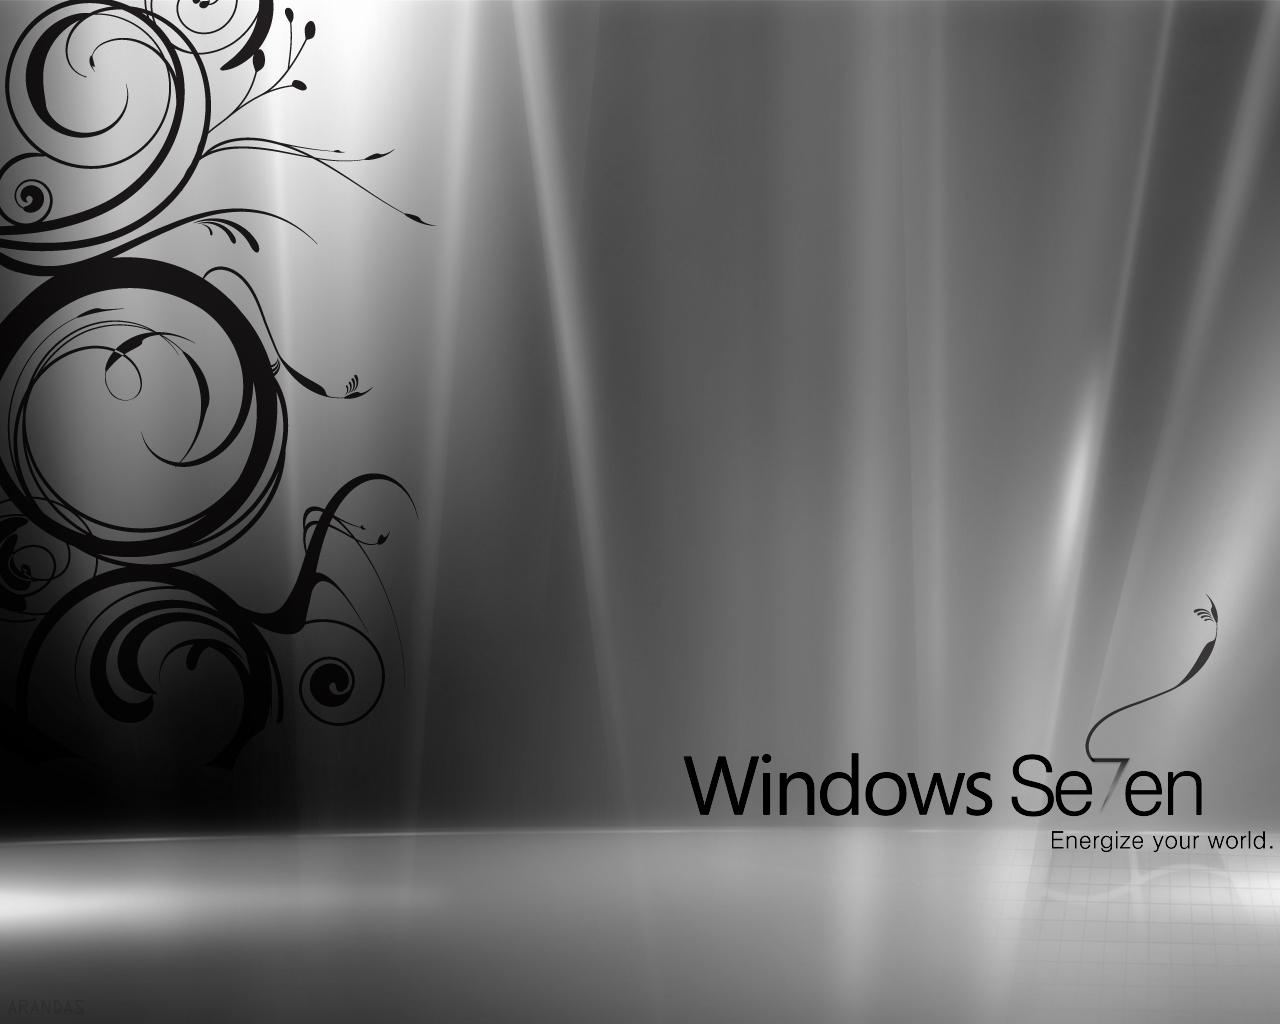 Windows 7 高清壁纸